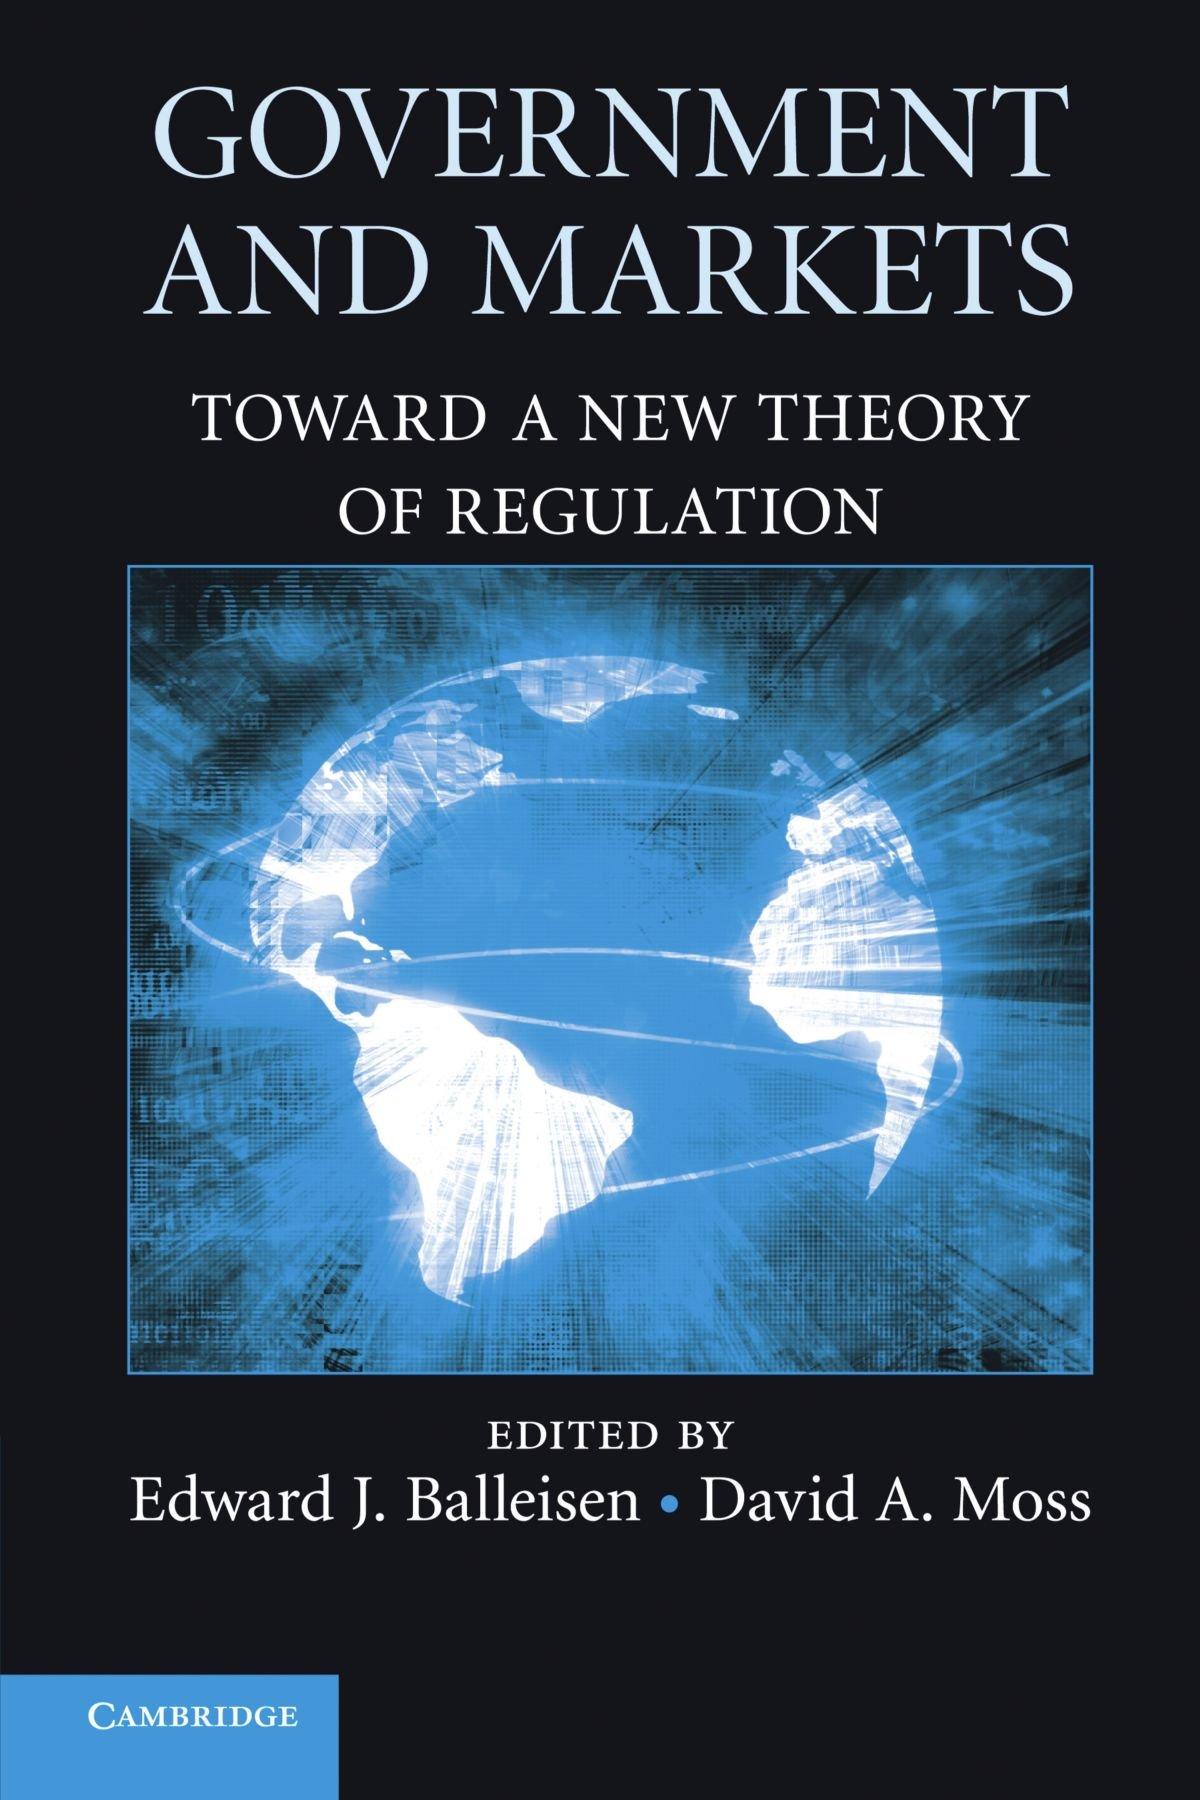 Government and Markets: Toward a New Theory of Regulation: Edward J.  Balleisen, David A. Moss: 9780521280532: Amazon.com: Books